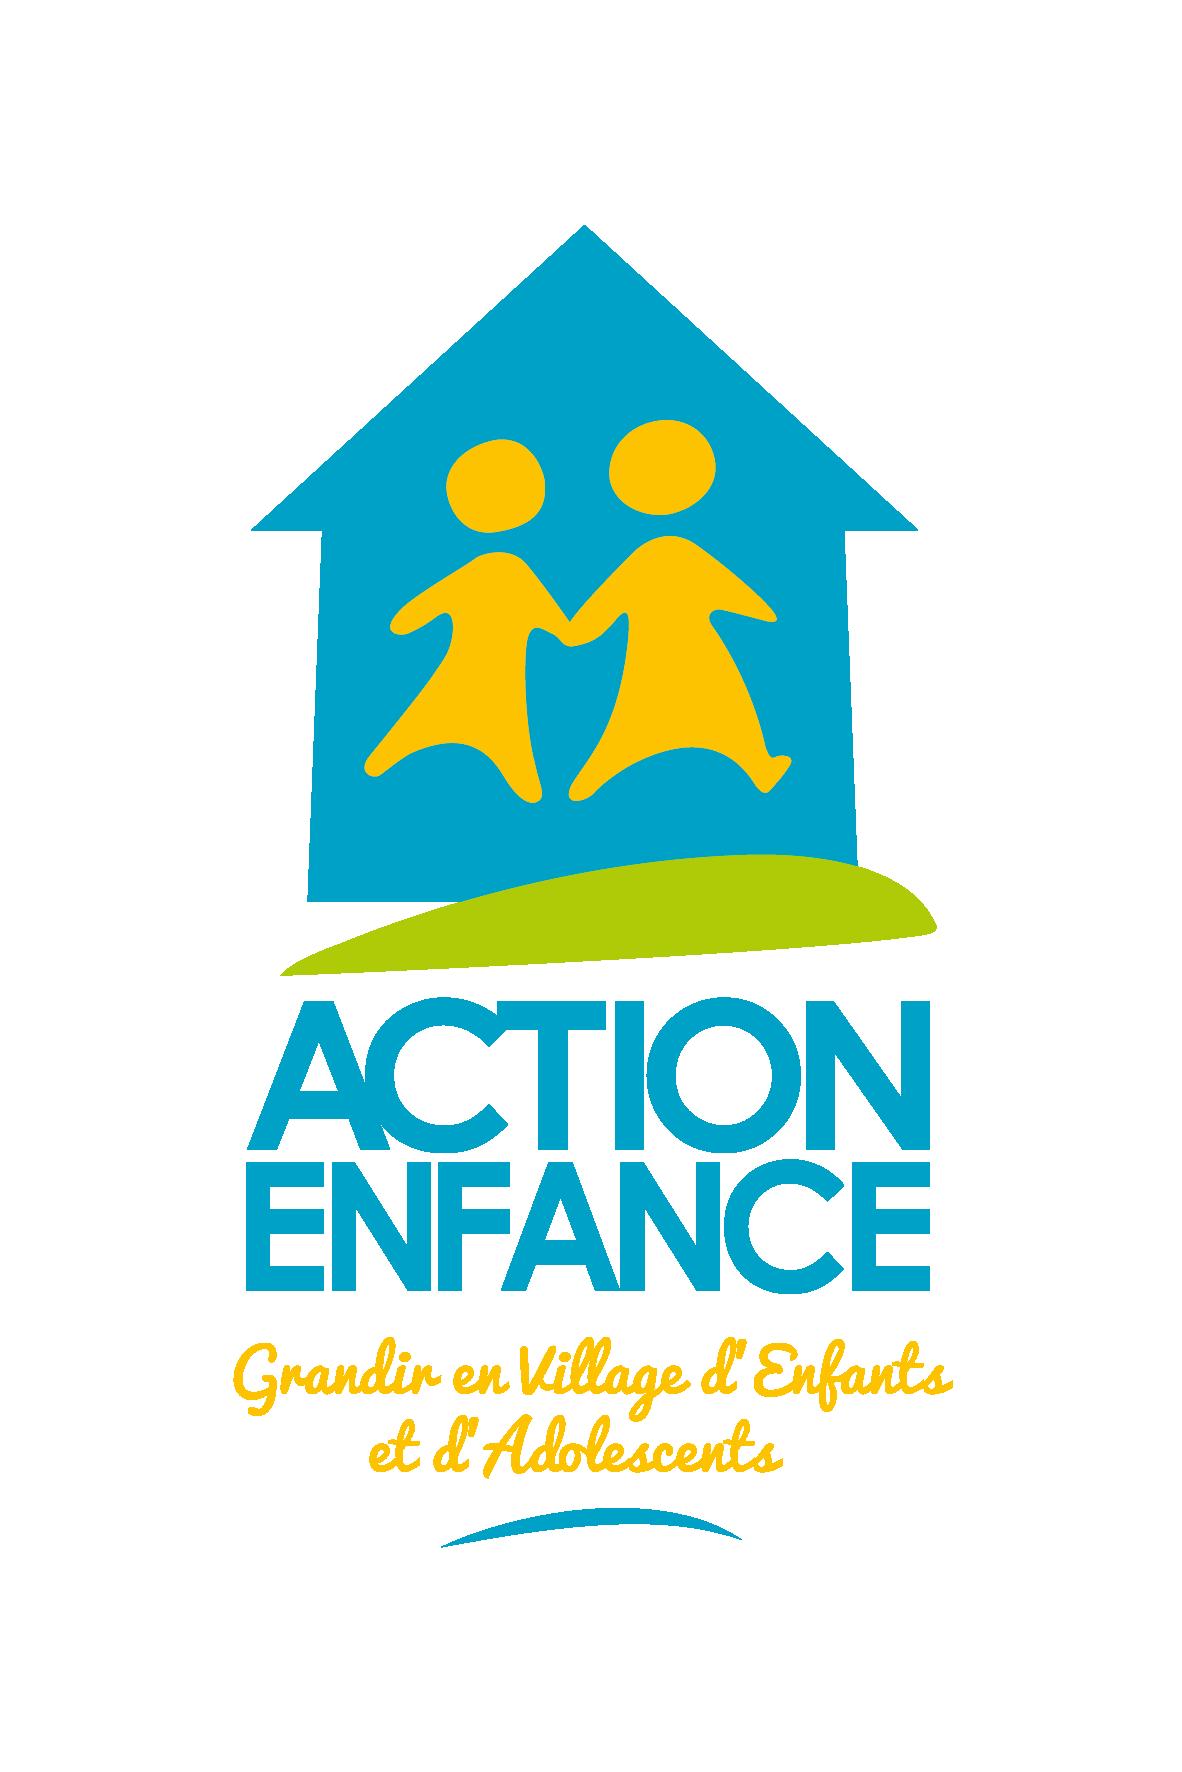 Action Enfance, grandir en Village d'Enfants